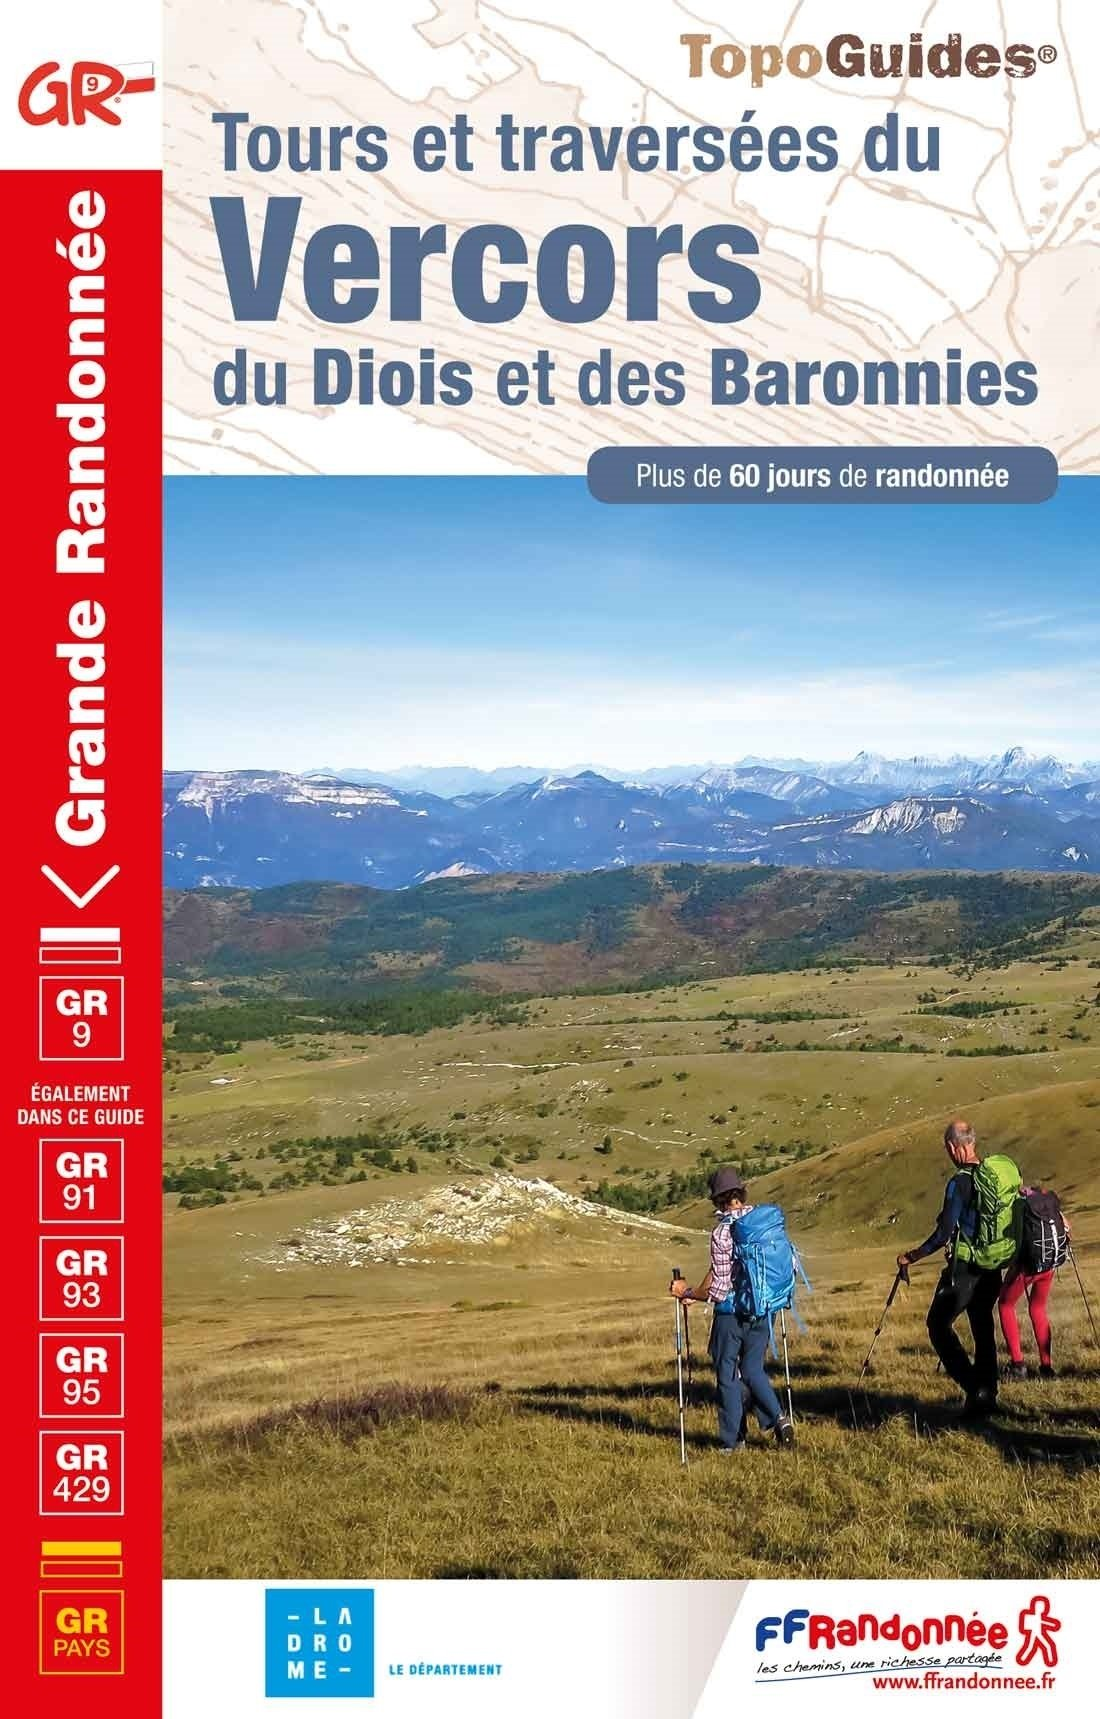 TG904  Vercors, Diois, Baronnies; GR9 9782751403910  FFRP Topoguides  Meerdaagse wandelroutes, Wandelgidsen Drôme, Vercors